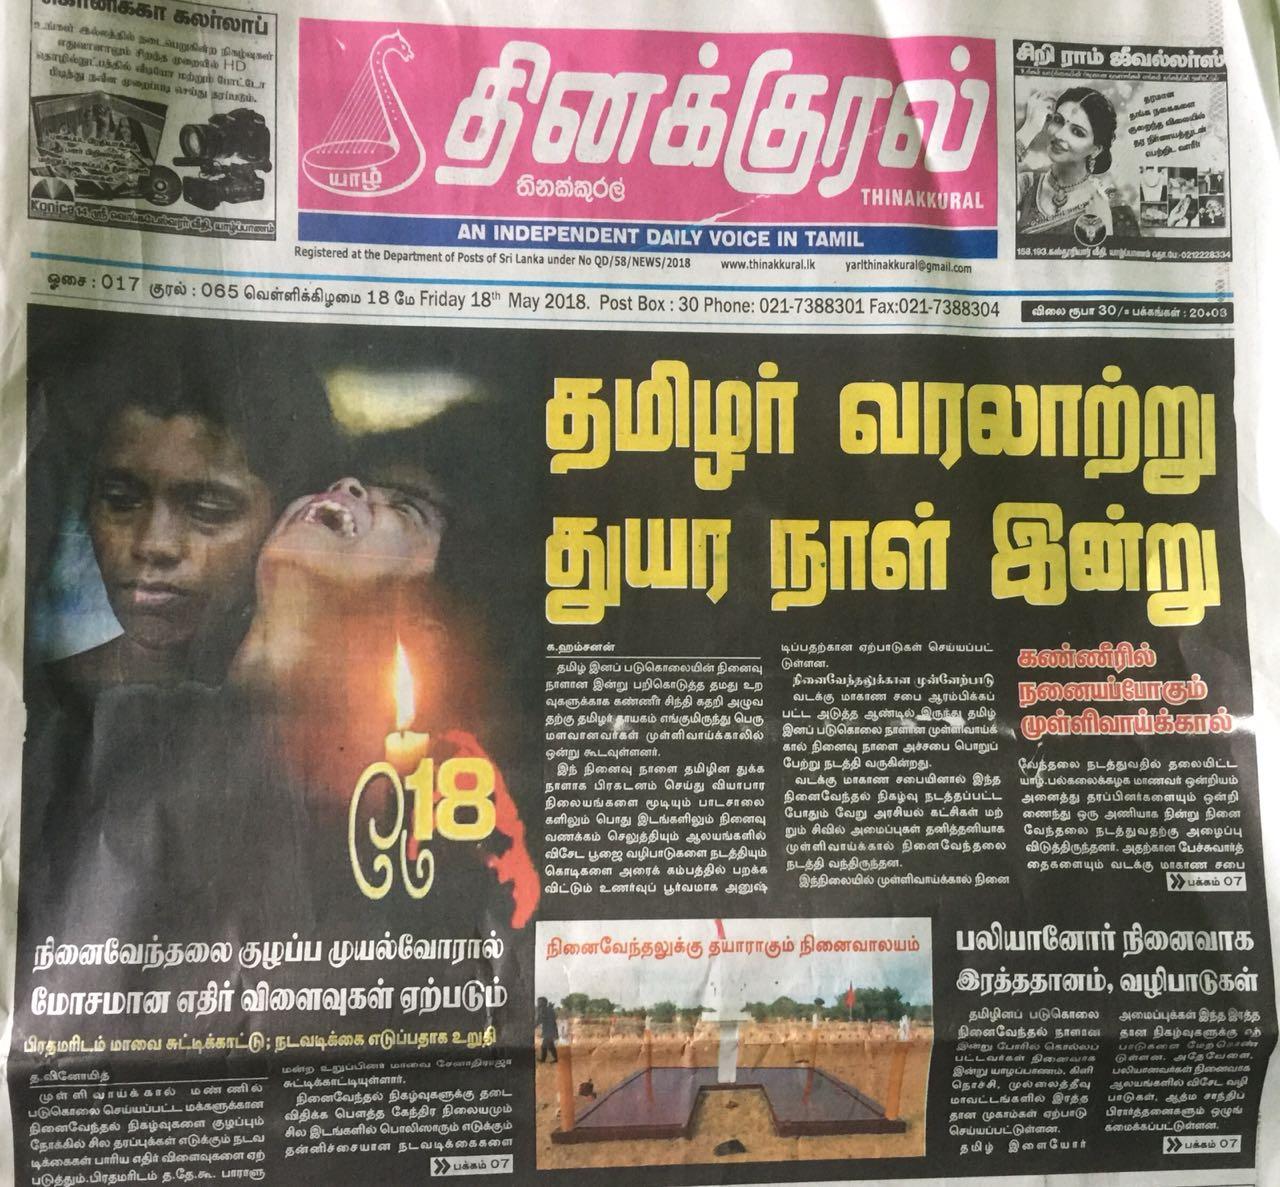 Tamil media remembers Mullivaikkaal massacre | Tamil Guardian